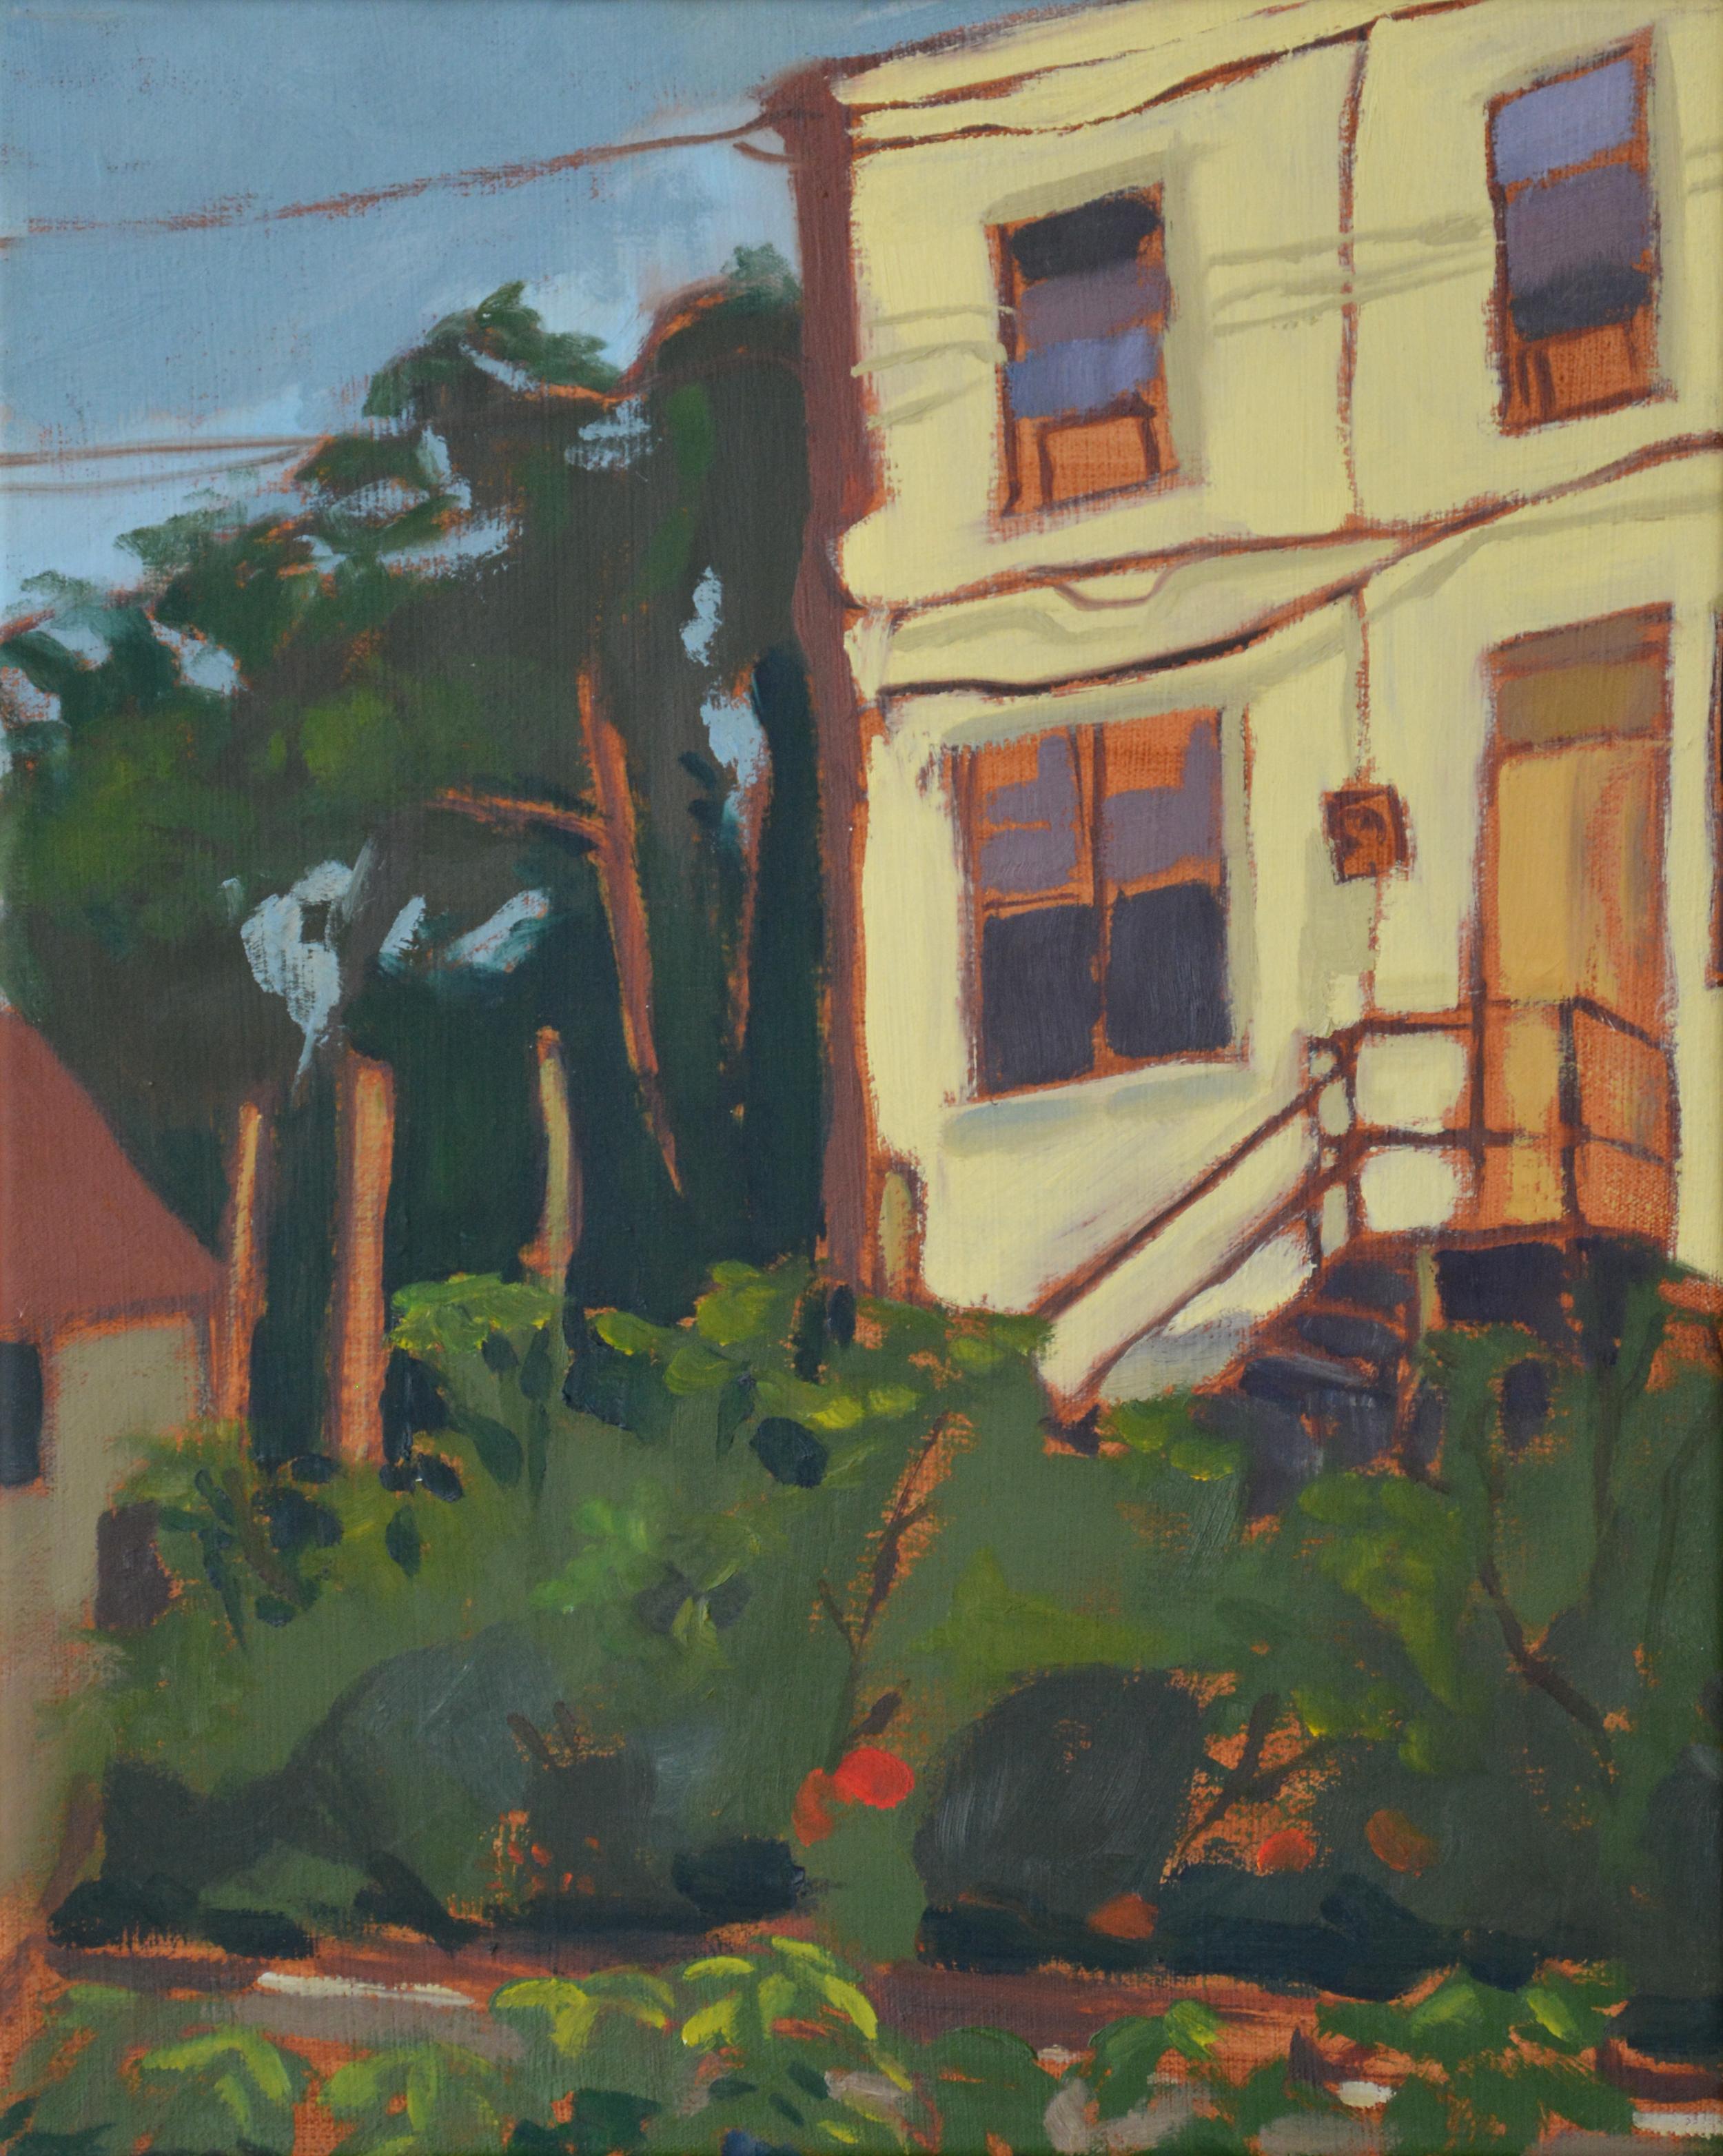 "Hunting Park Community Garden, 17x20"", oil on canvas, 2008"